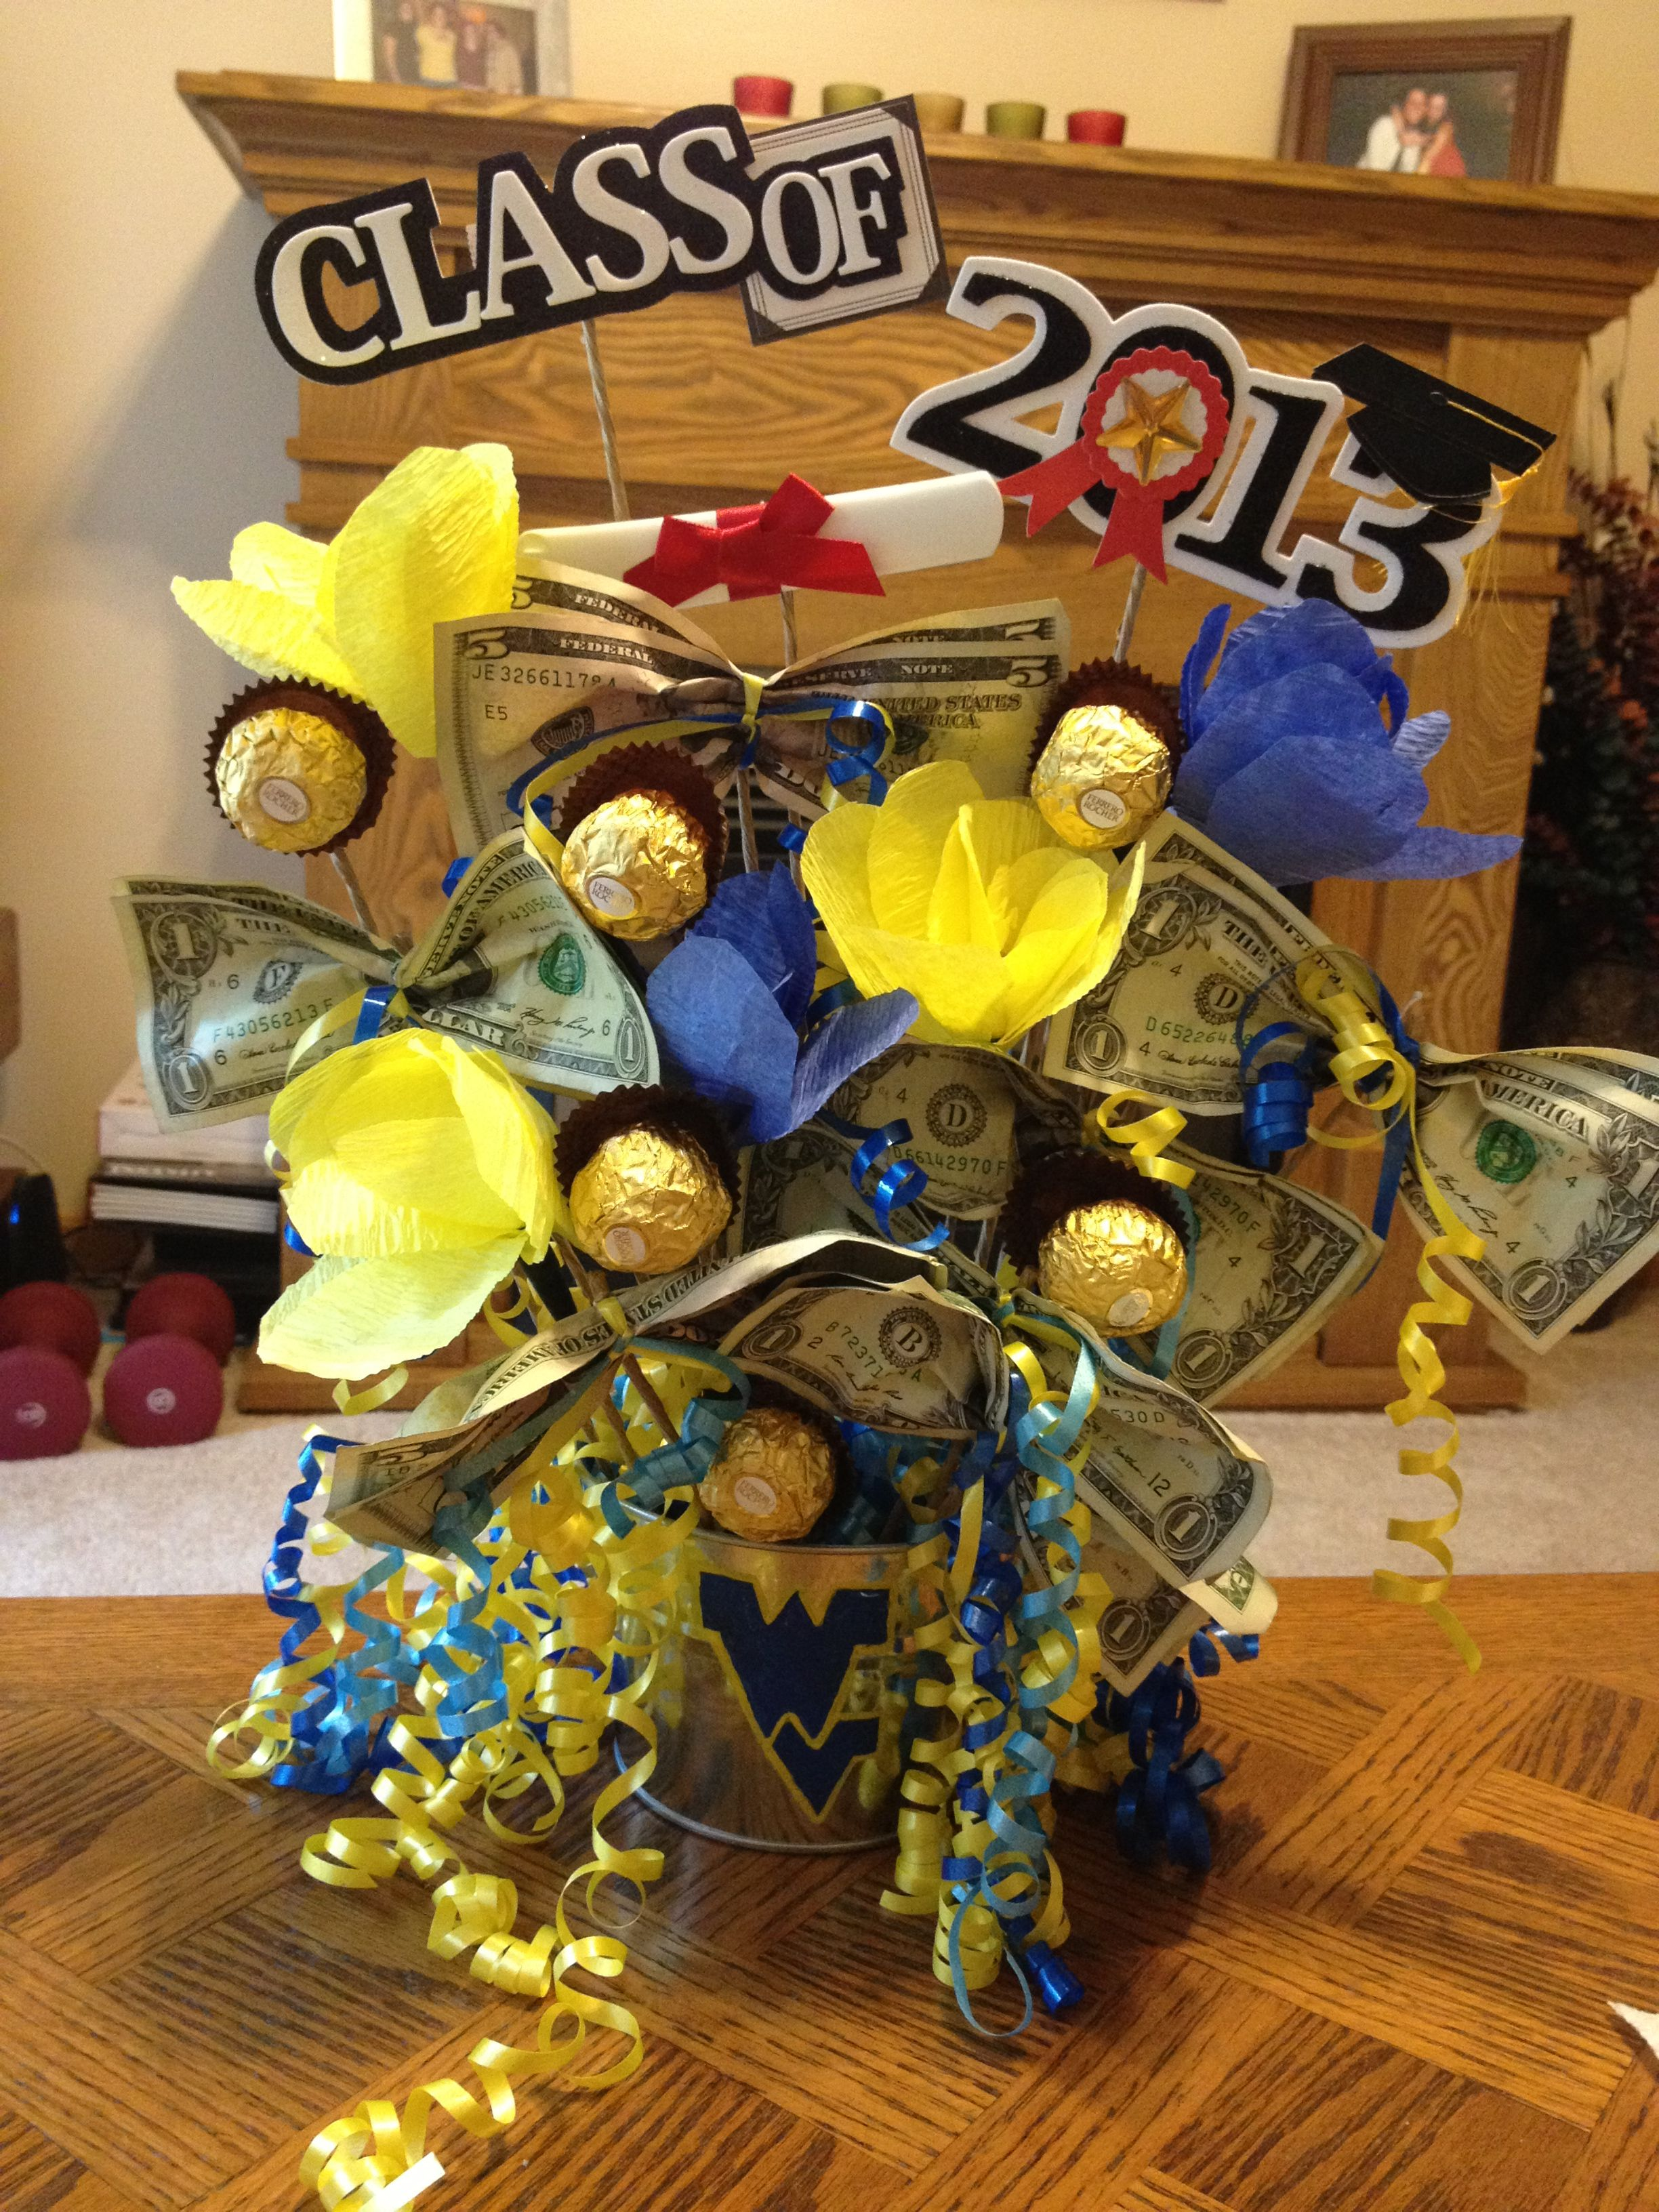 Graduation gift graduation party gifts graduation gifts